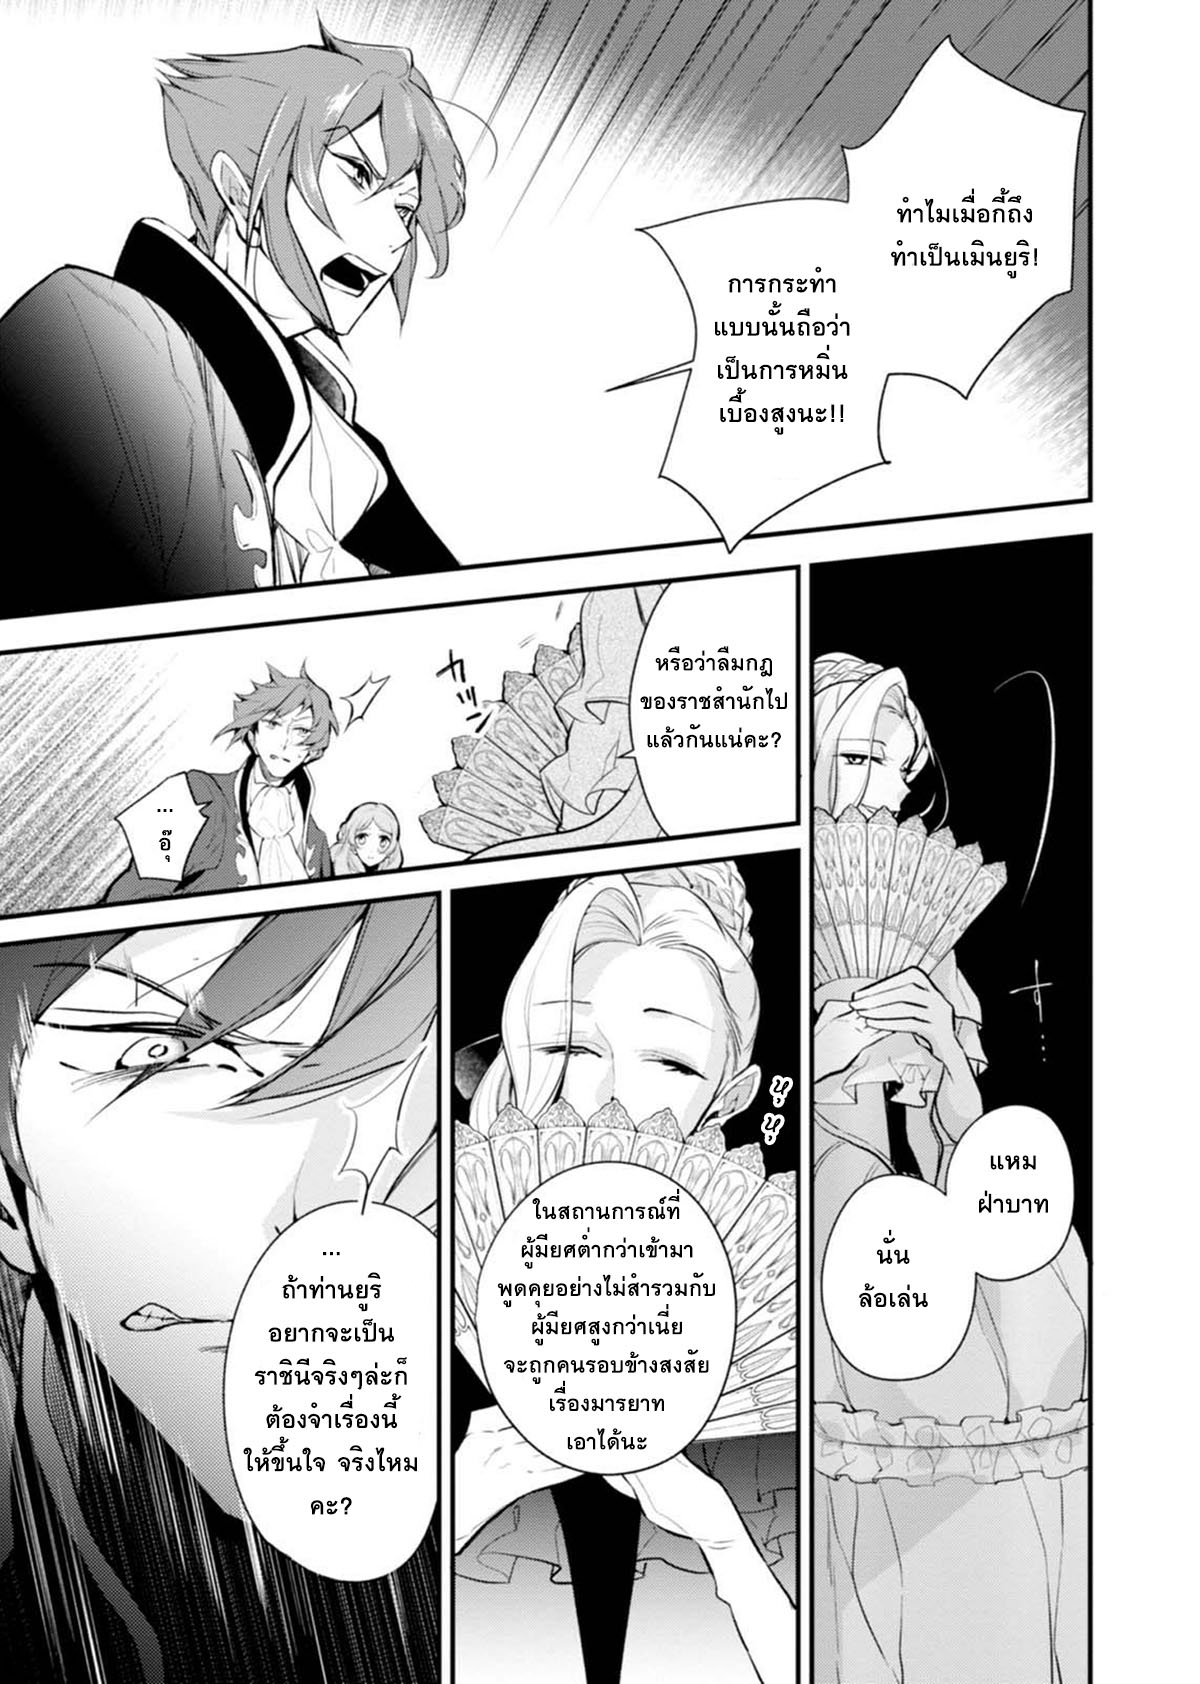 Koushaku reijou no tashinami ตอนที่ 29 TH แปลไทย